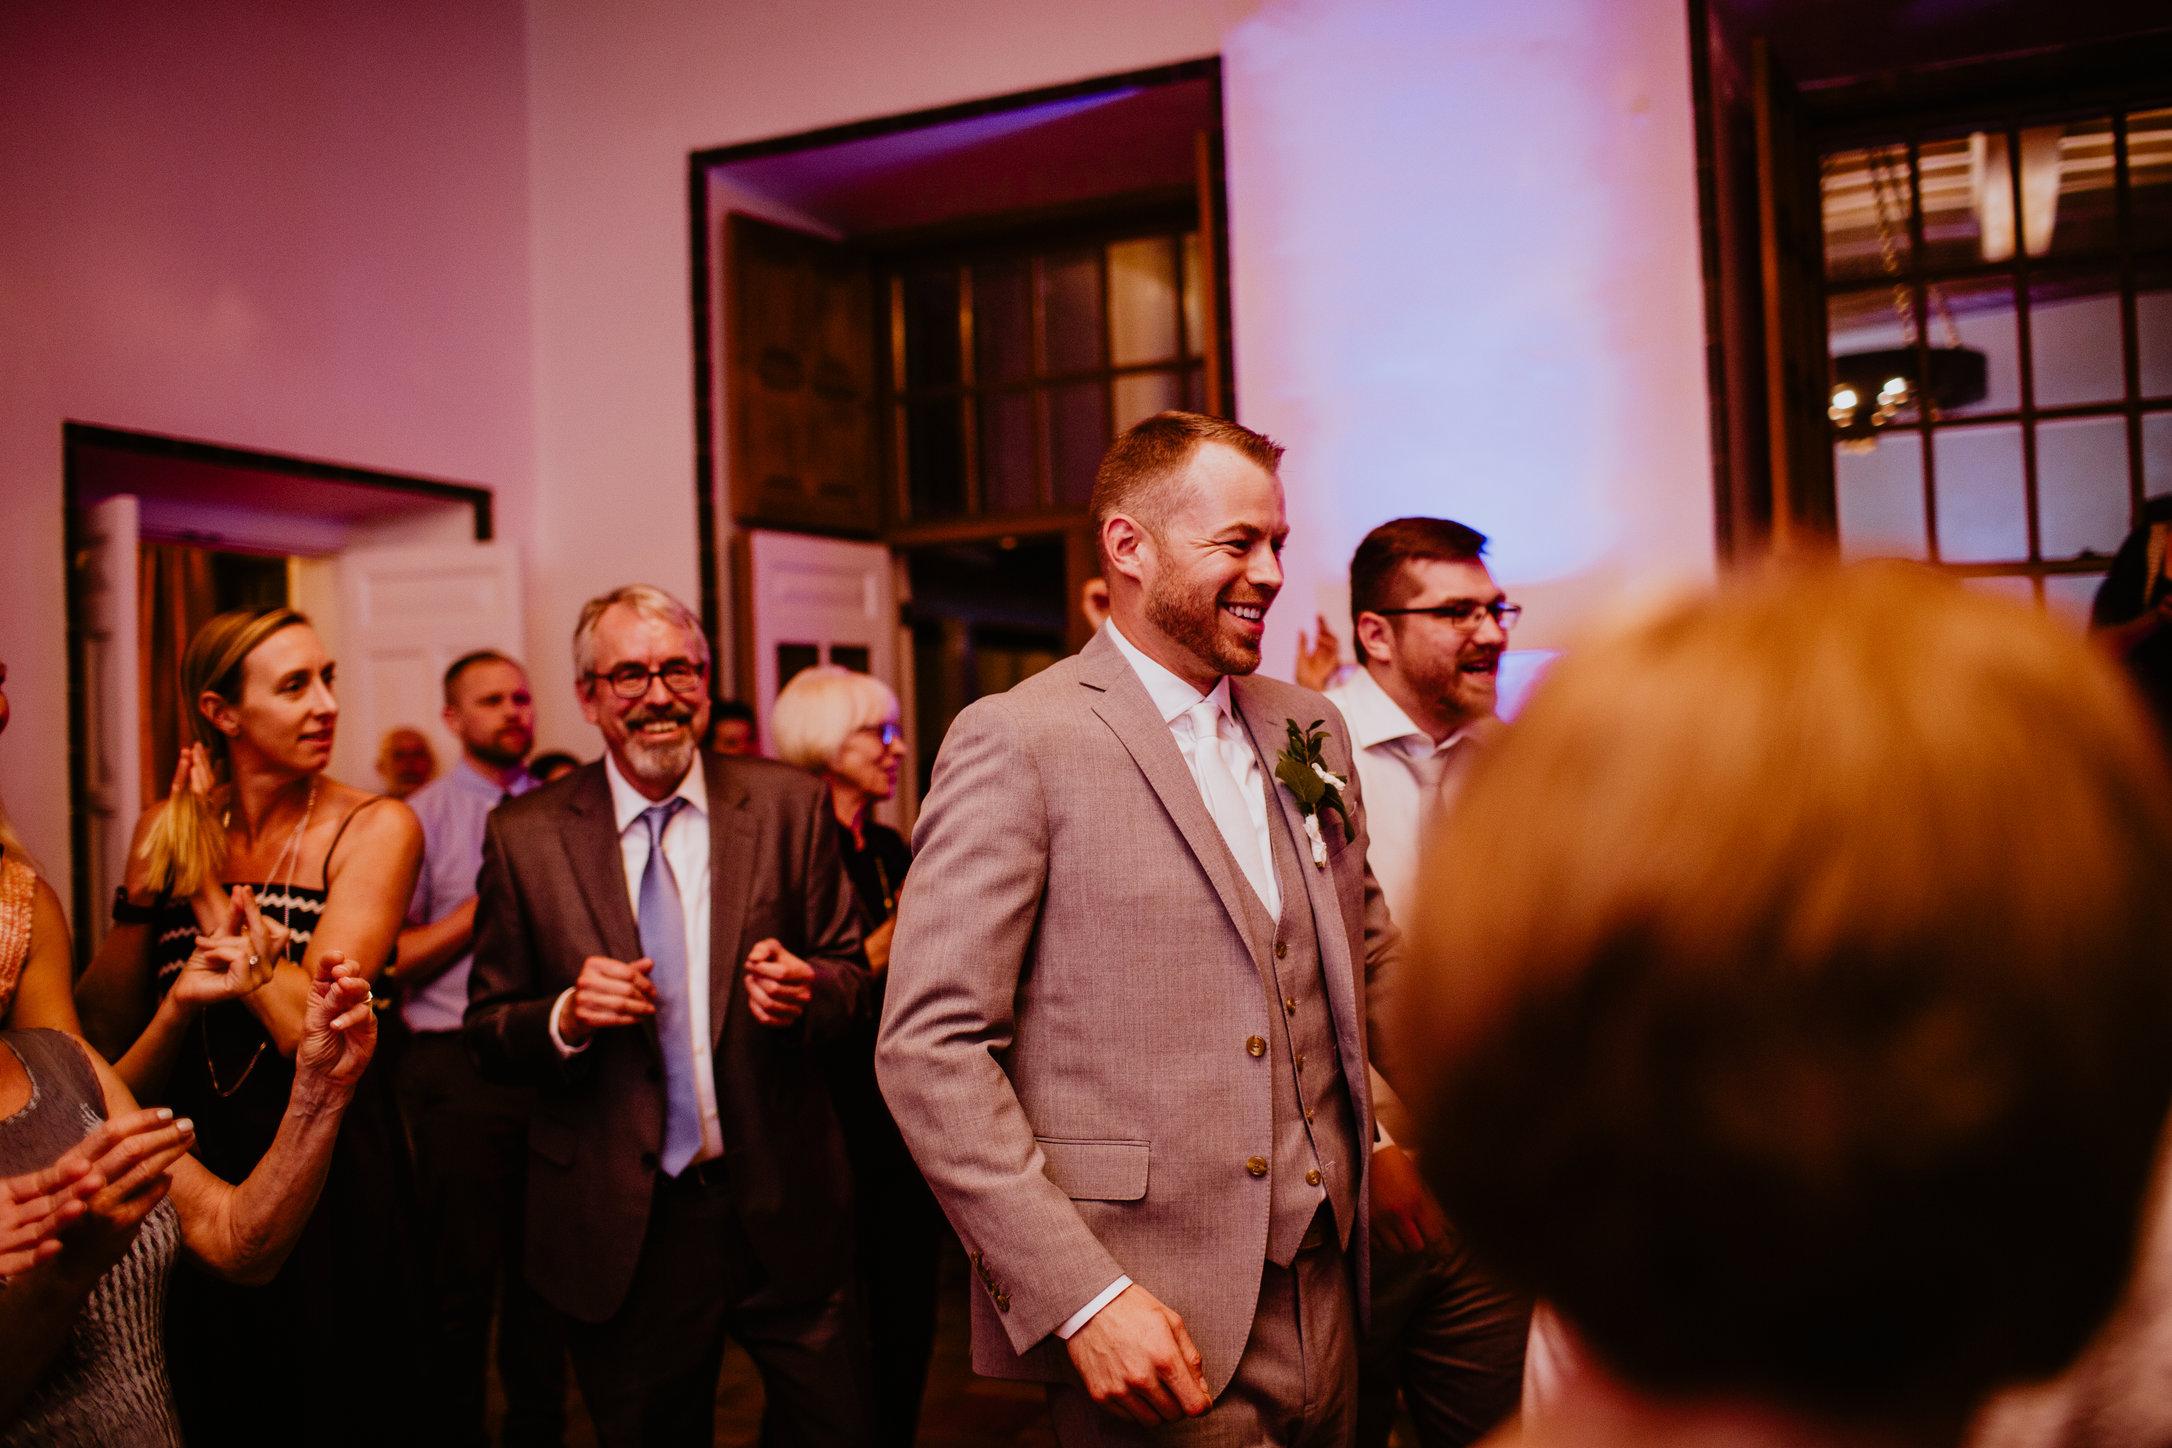 DandA-wedding-845.jpg